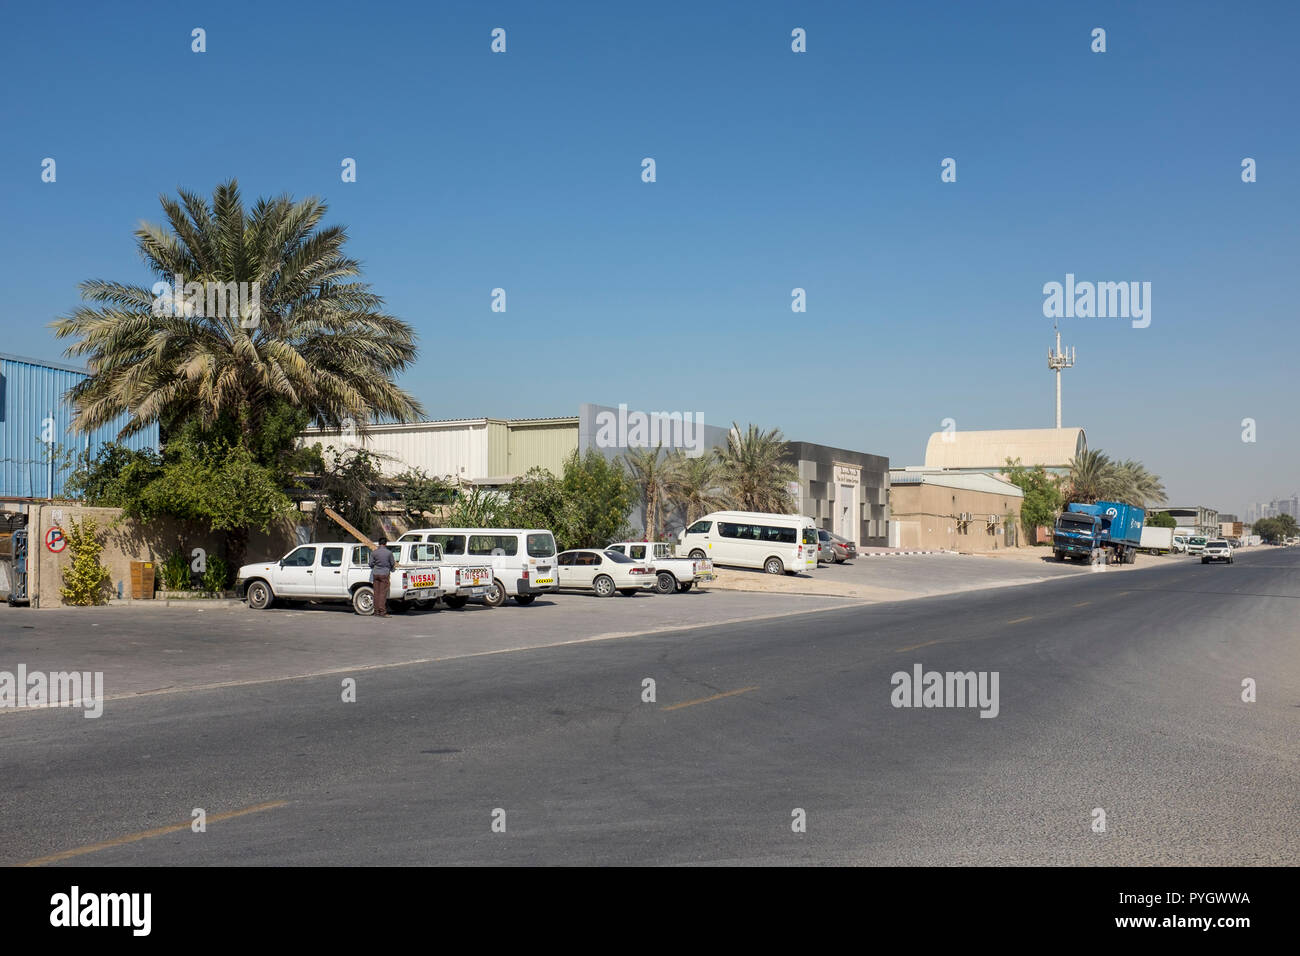 Al Quoz Stock Photos & Al Quoz Stock Images - Alamy